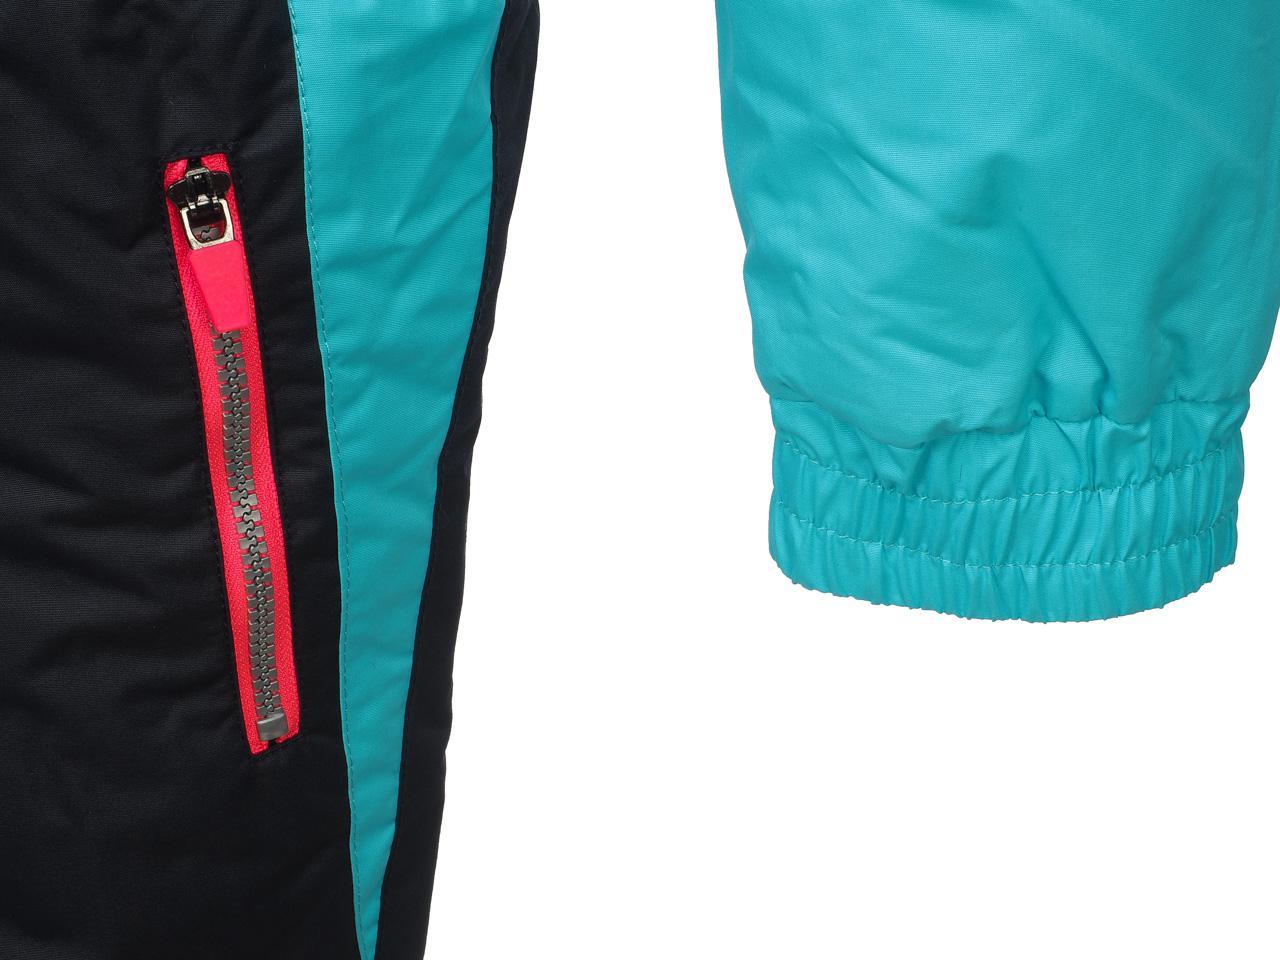 Skianzug-Longboard-Jil-Blau-Combiski-Juengste-Tochter-Blau-50643-Neu Indexbild 4